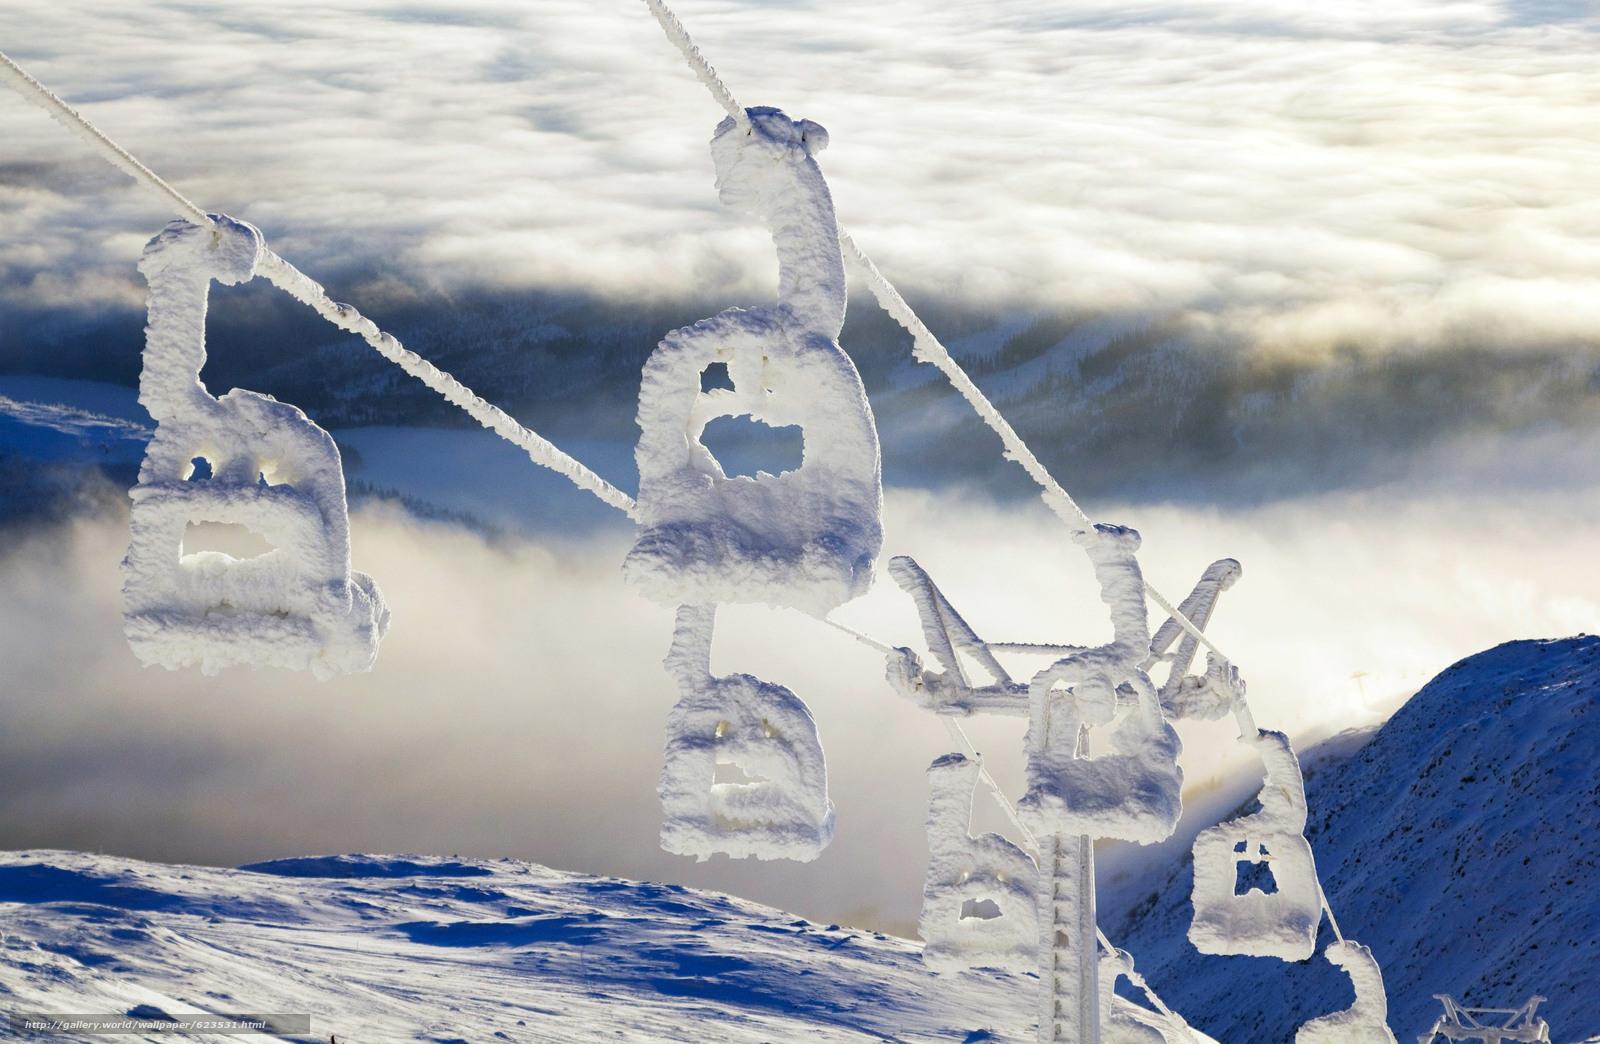 Скачать на телефон обои фото картинку на тему подъемник, гора, Areskutan, Швеция, разширение 3087x2015